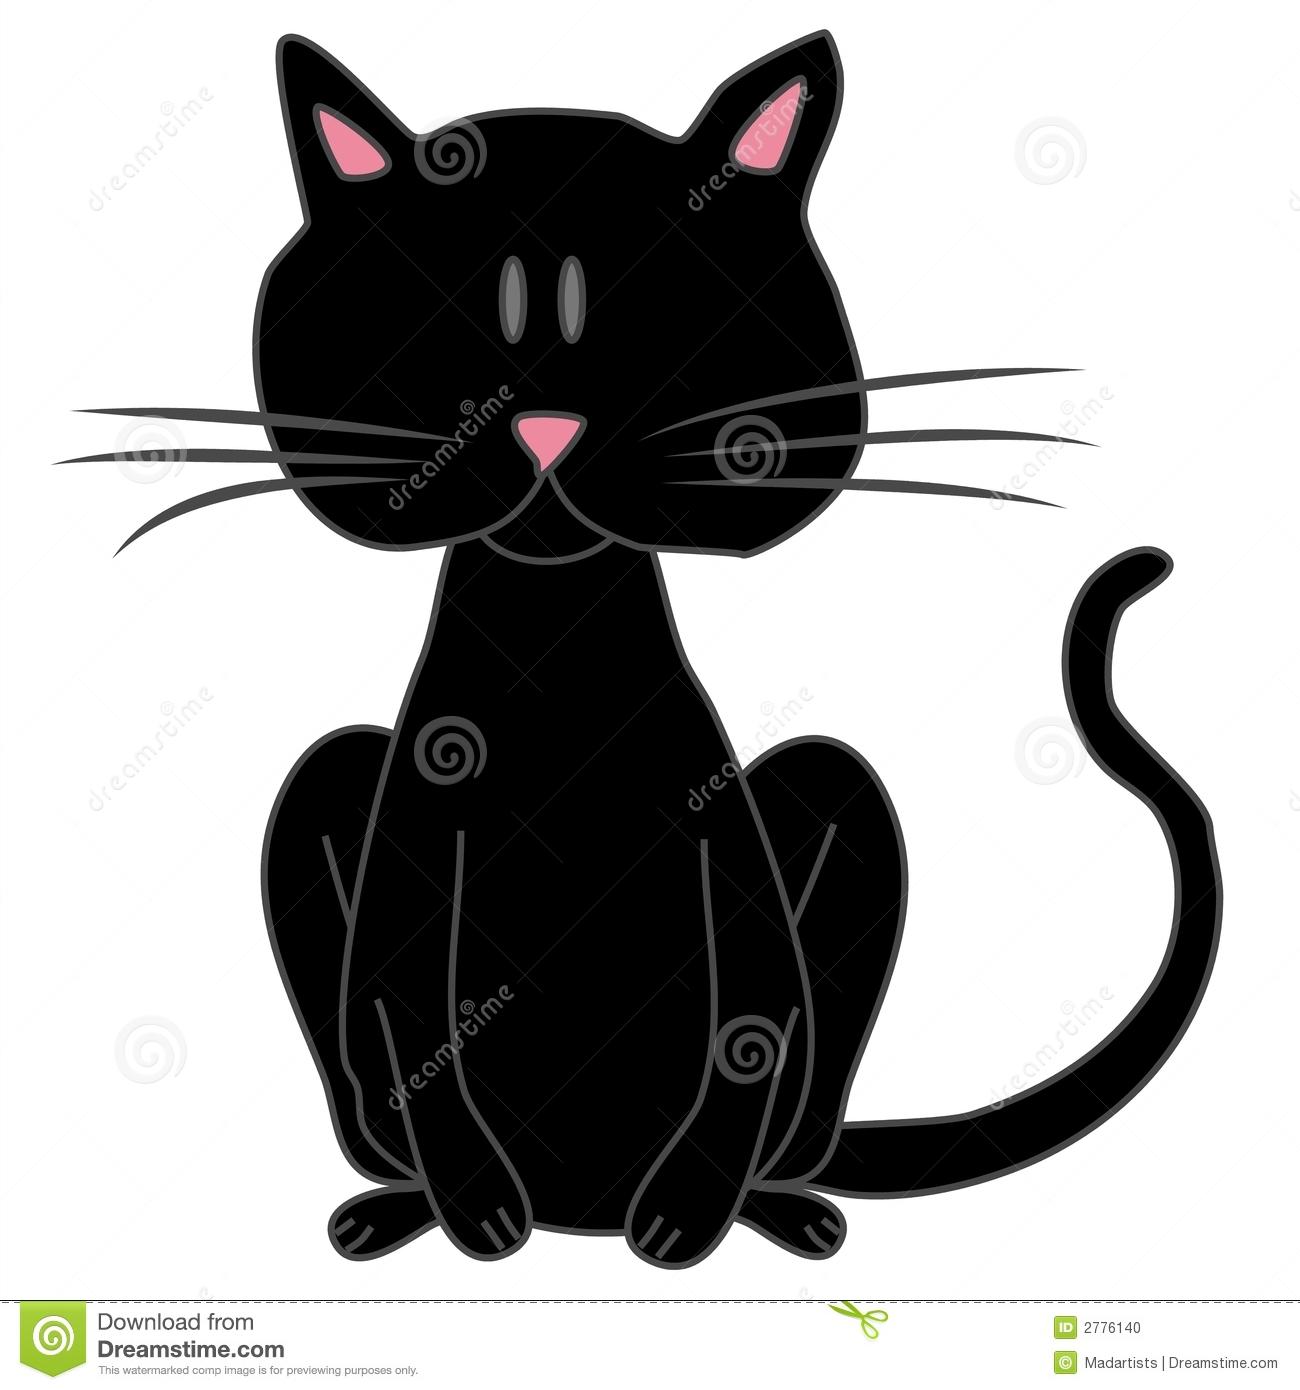 Black Cat clipart black object Free Images Panda Art Clipart